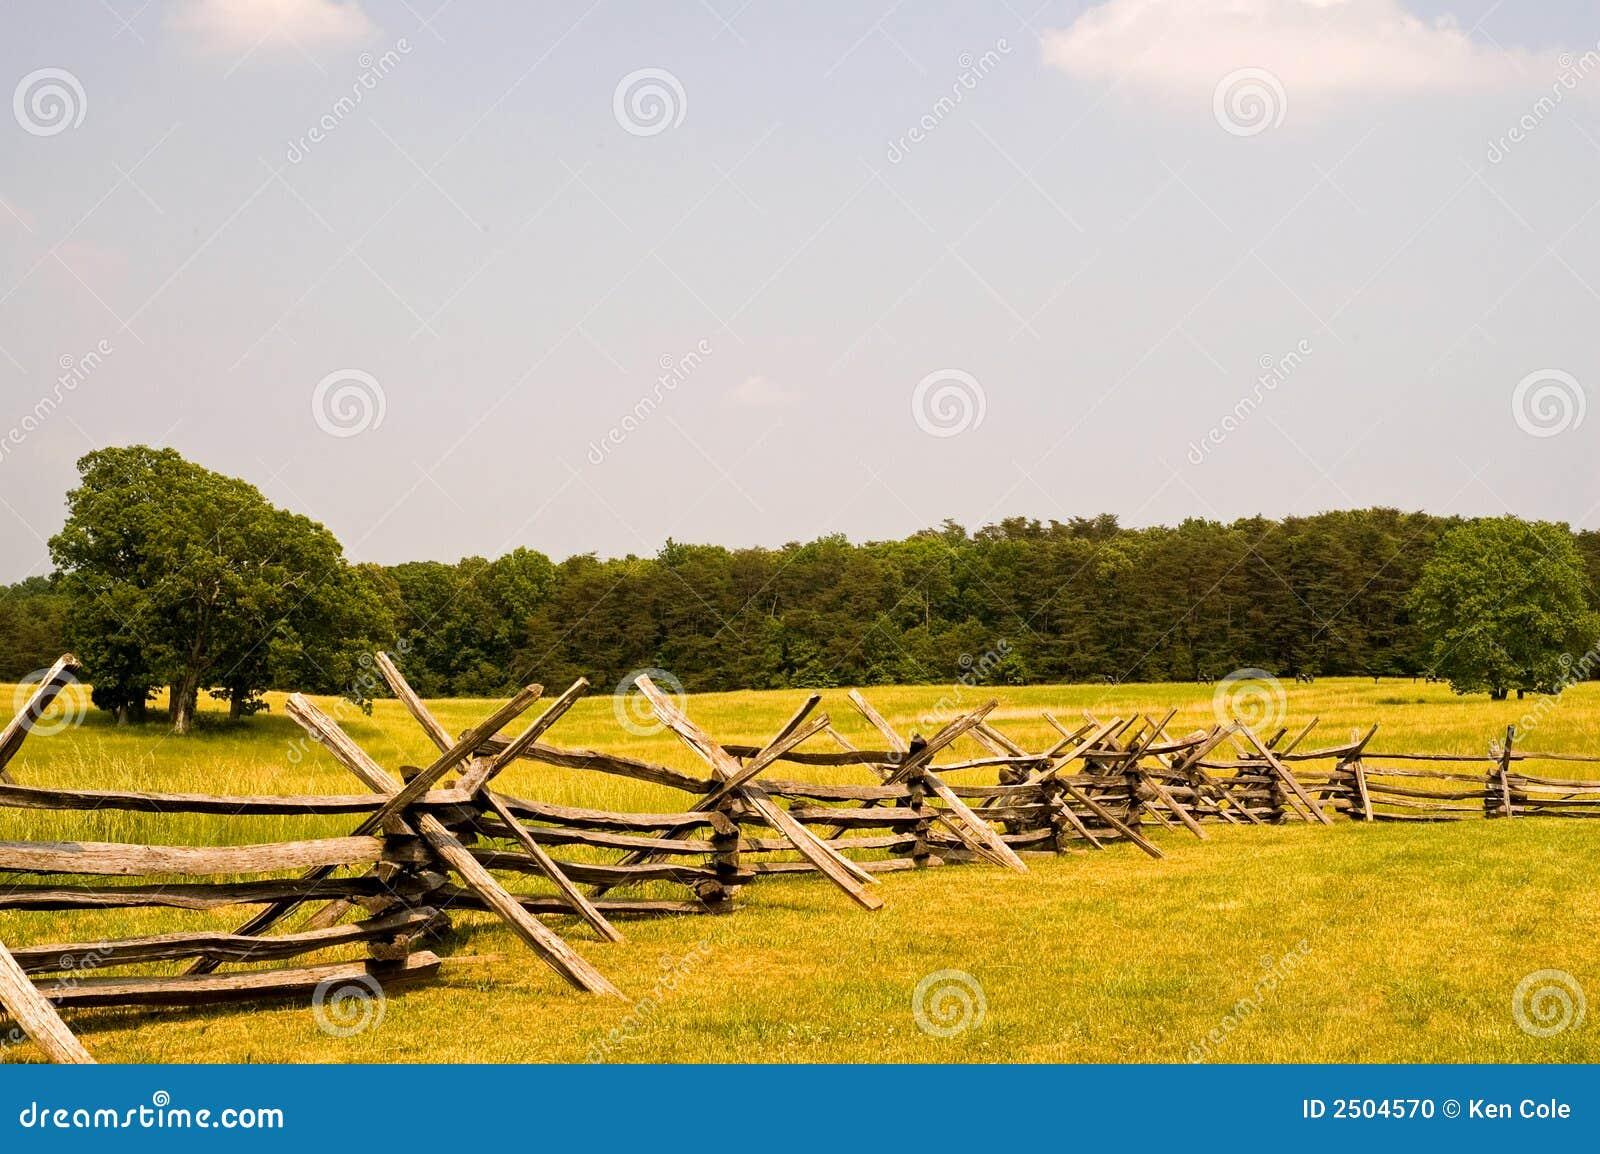 American Civil War Battlefield Stock Photo Image 2504570